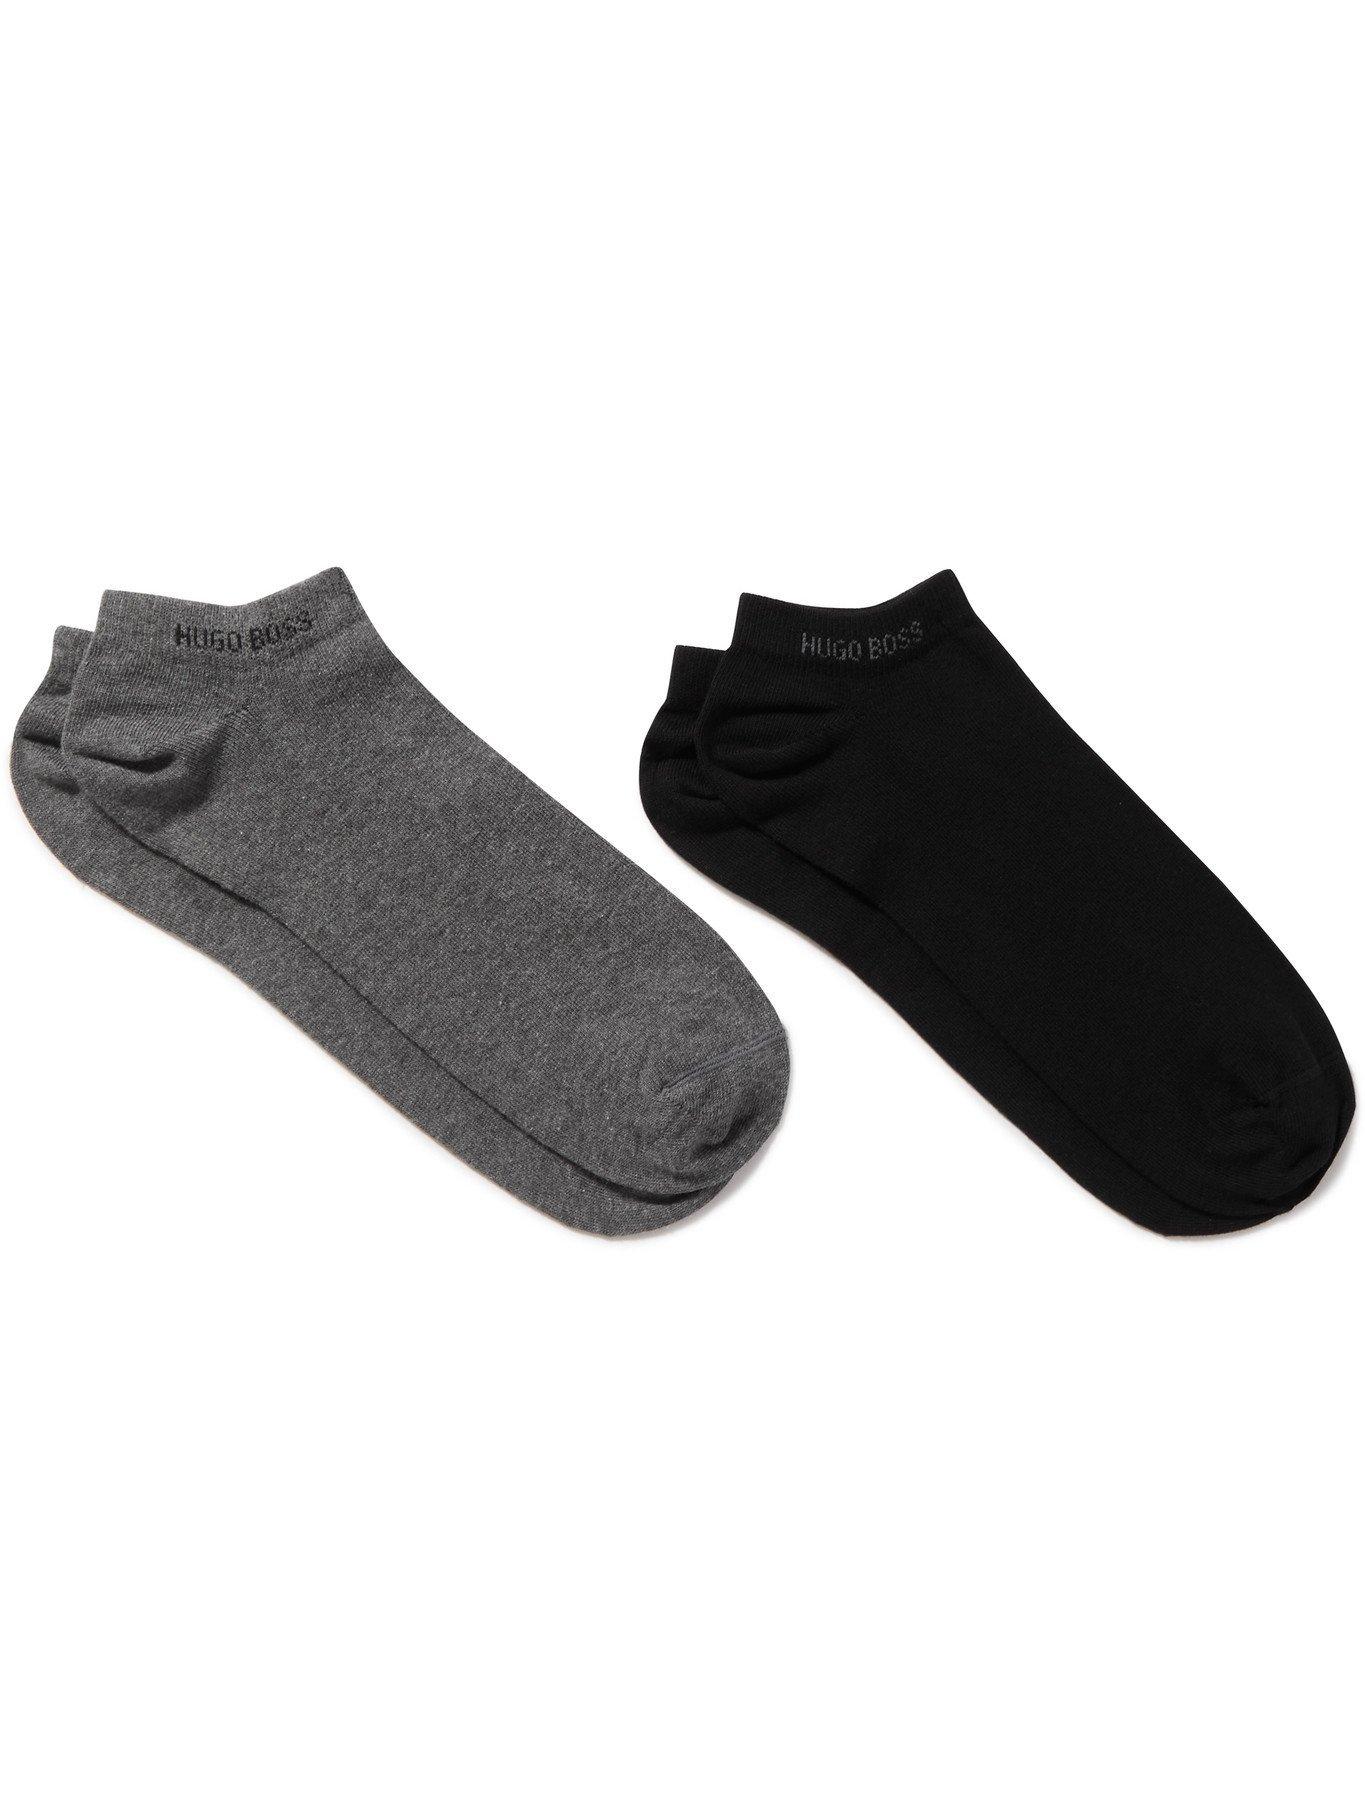 HUGO BOSS - Two-Pack Stretch Cotton-Blend No-Show Socks - Gray